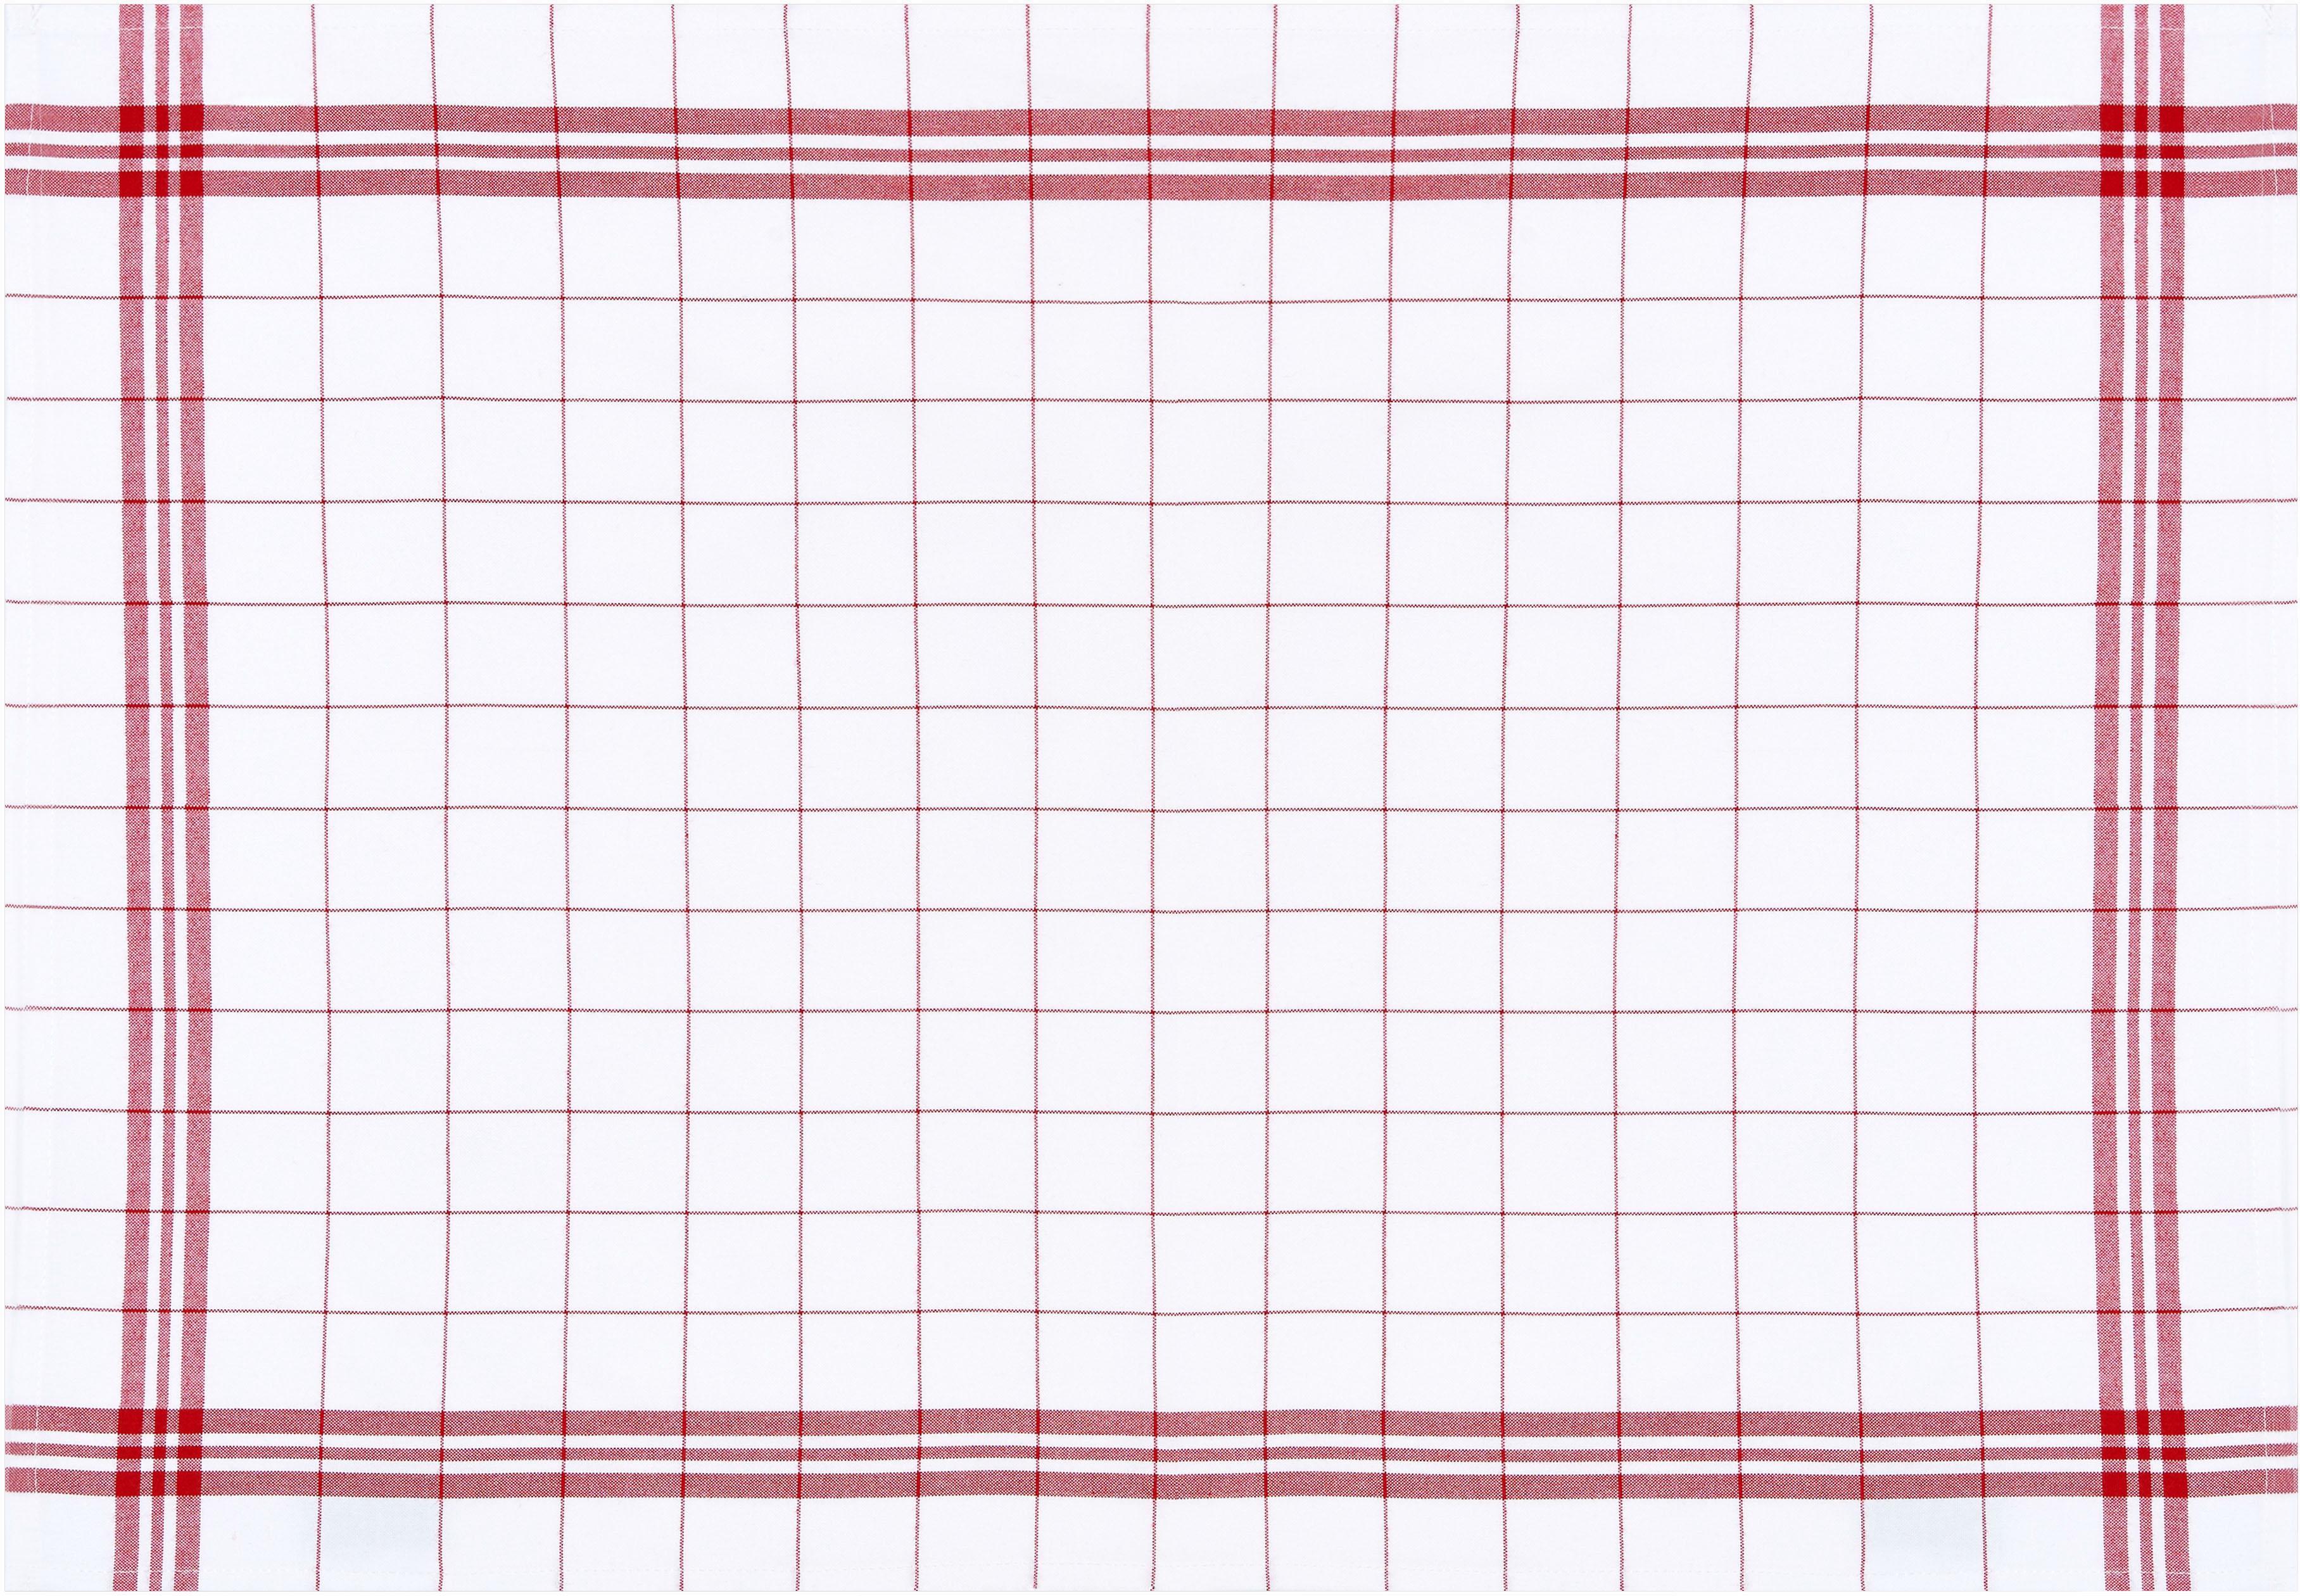 stuco Geschirrtuch Bambus, kariert, (Set, 3 tlg.) weiß Geschirrtücher Küchenhelfer Haushaltswaren